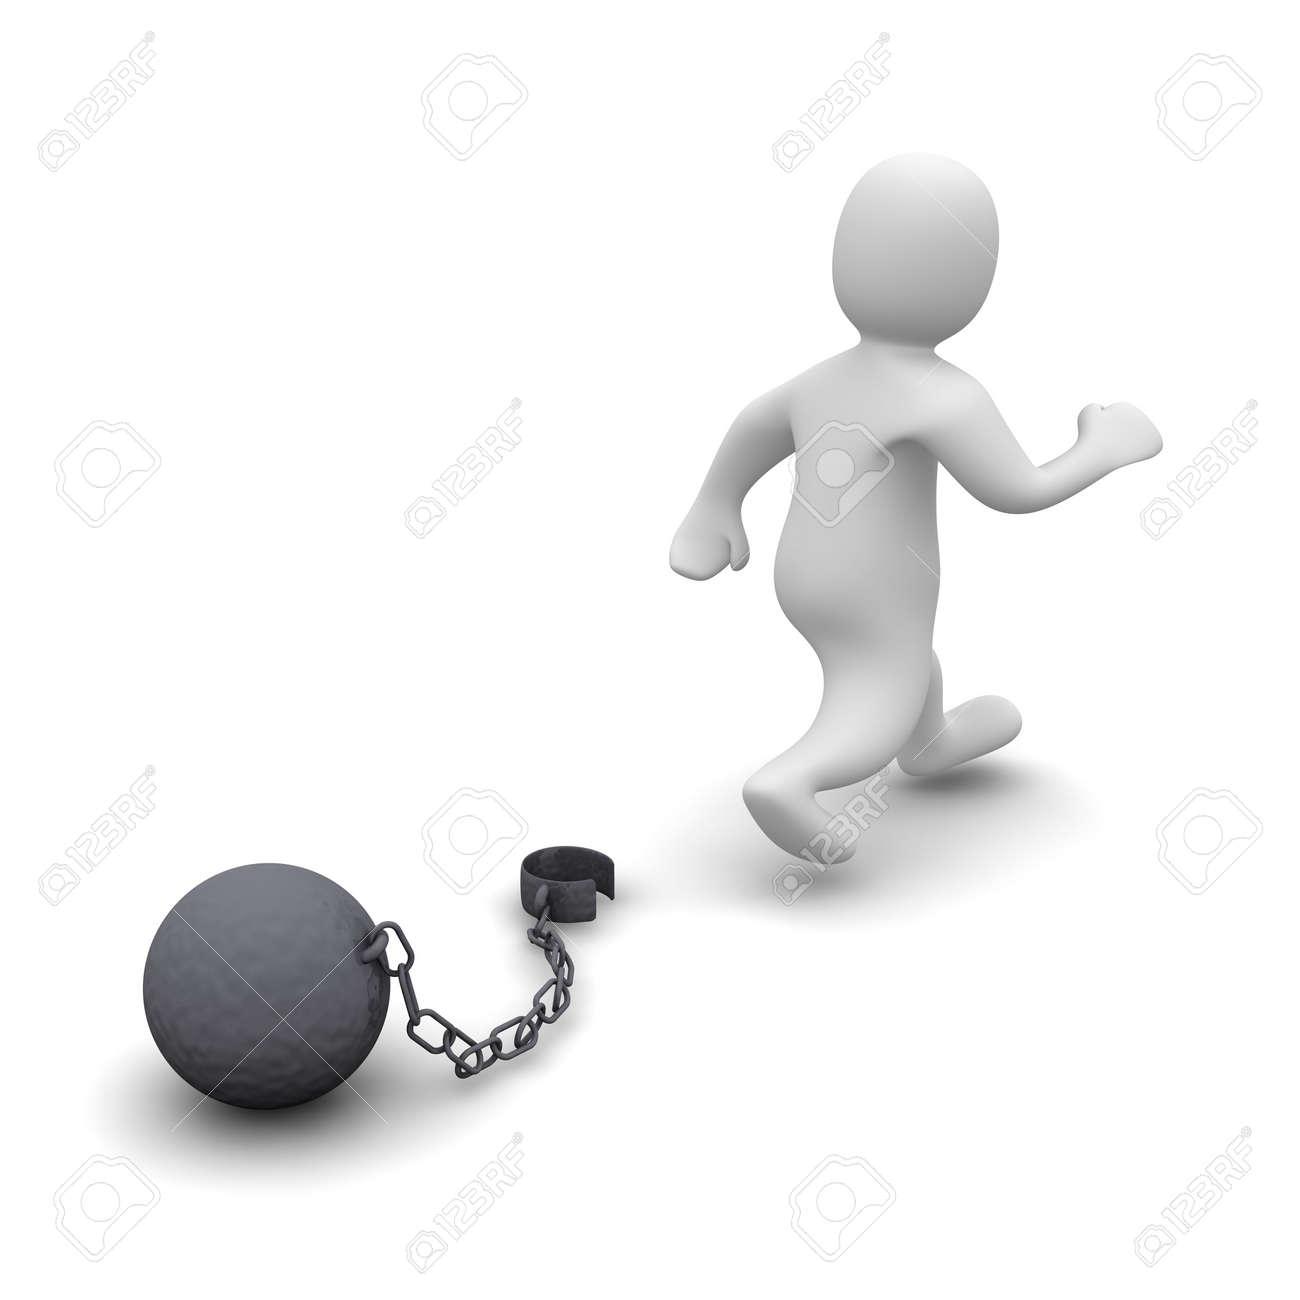 Escaping criminal. 3d rendered illustration isolated on white. Stock Illustration - 5024208